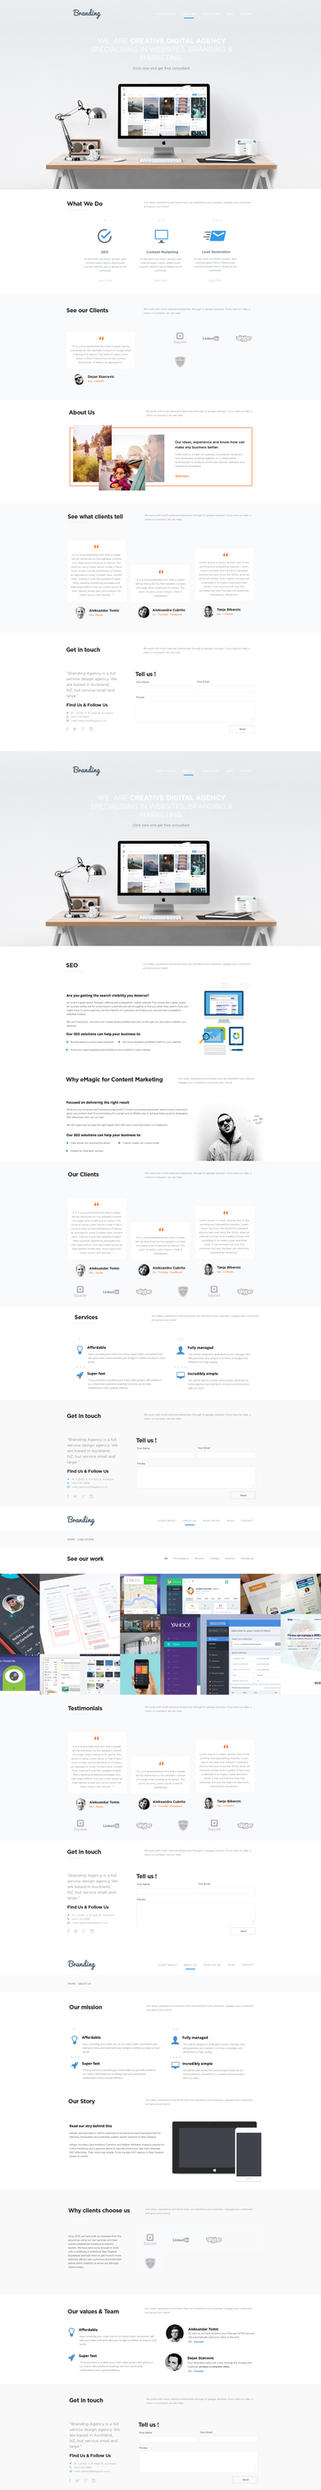 Development Agency Web Design by vasiligfx